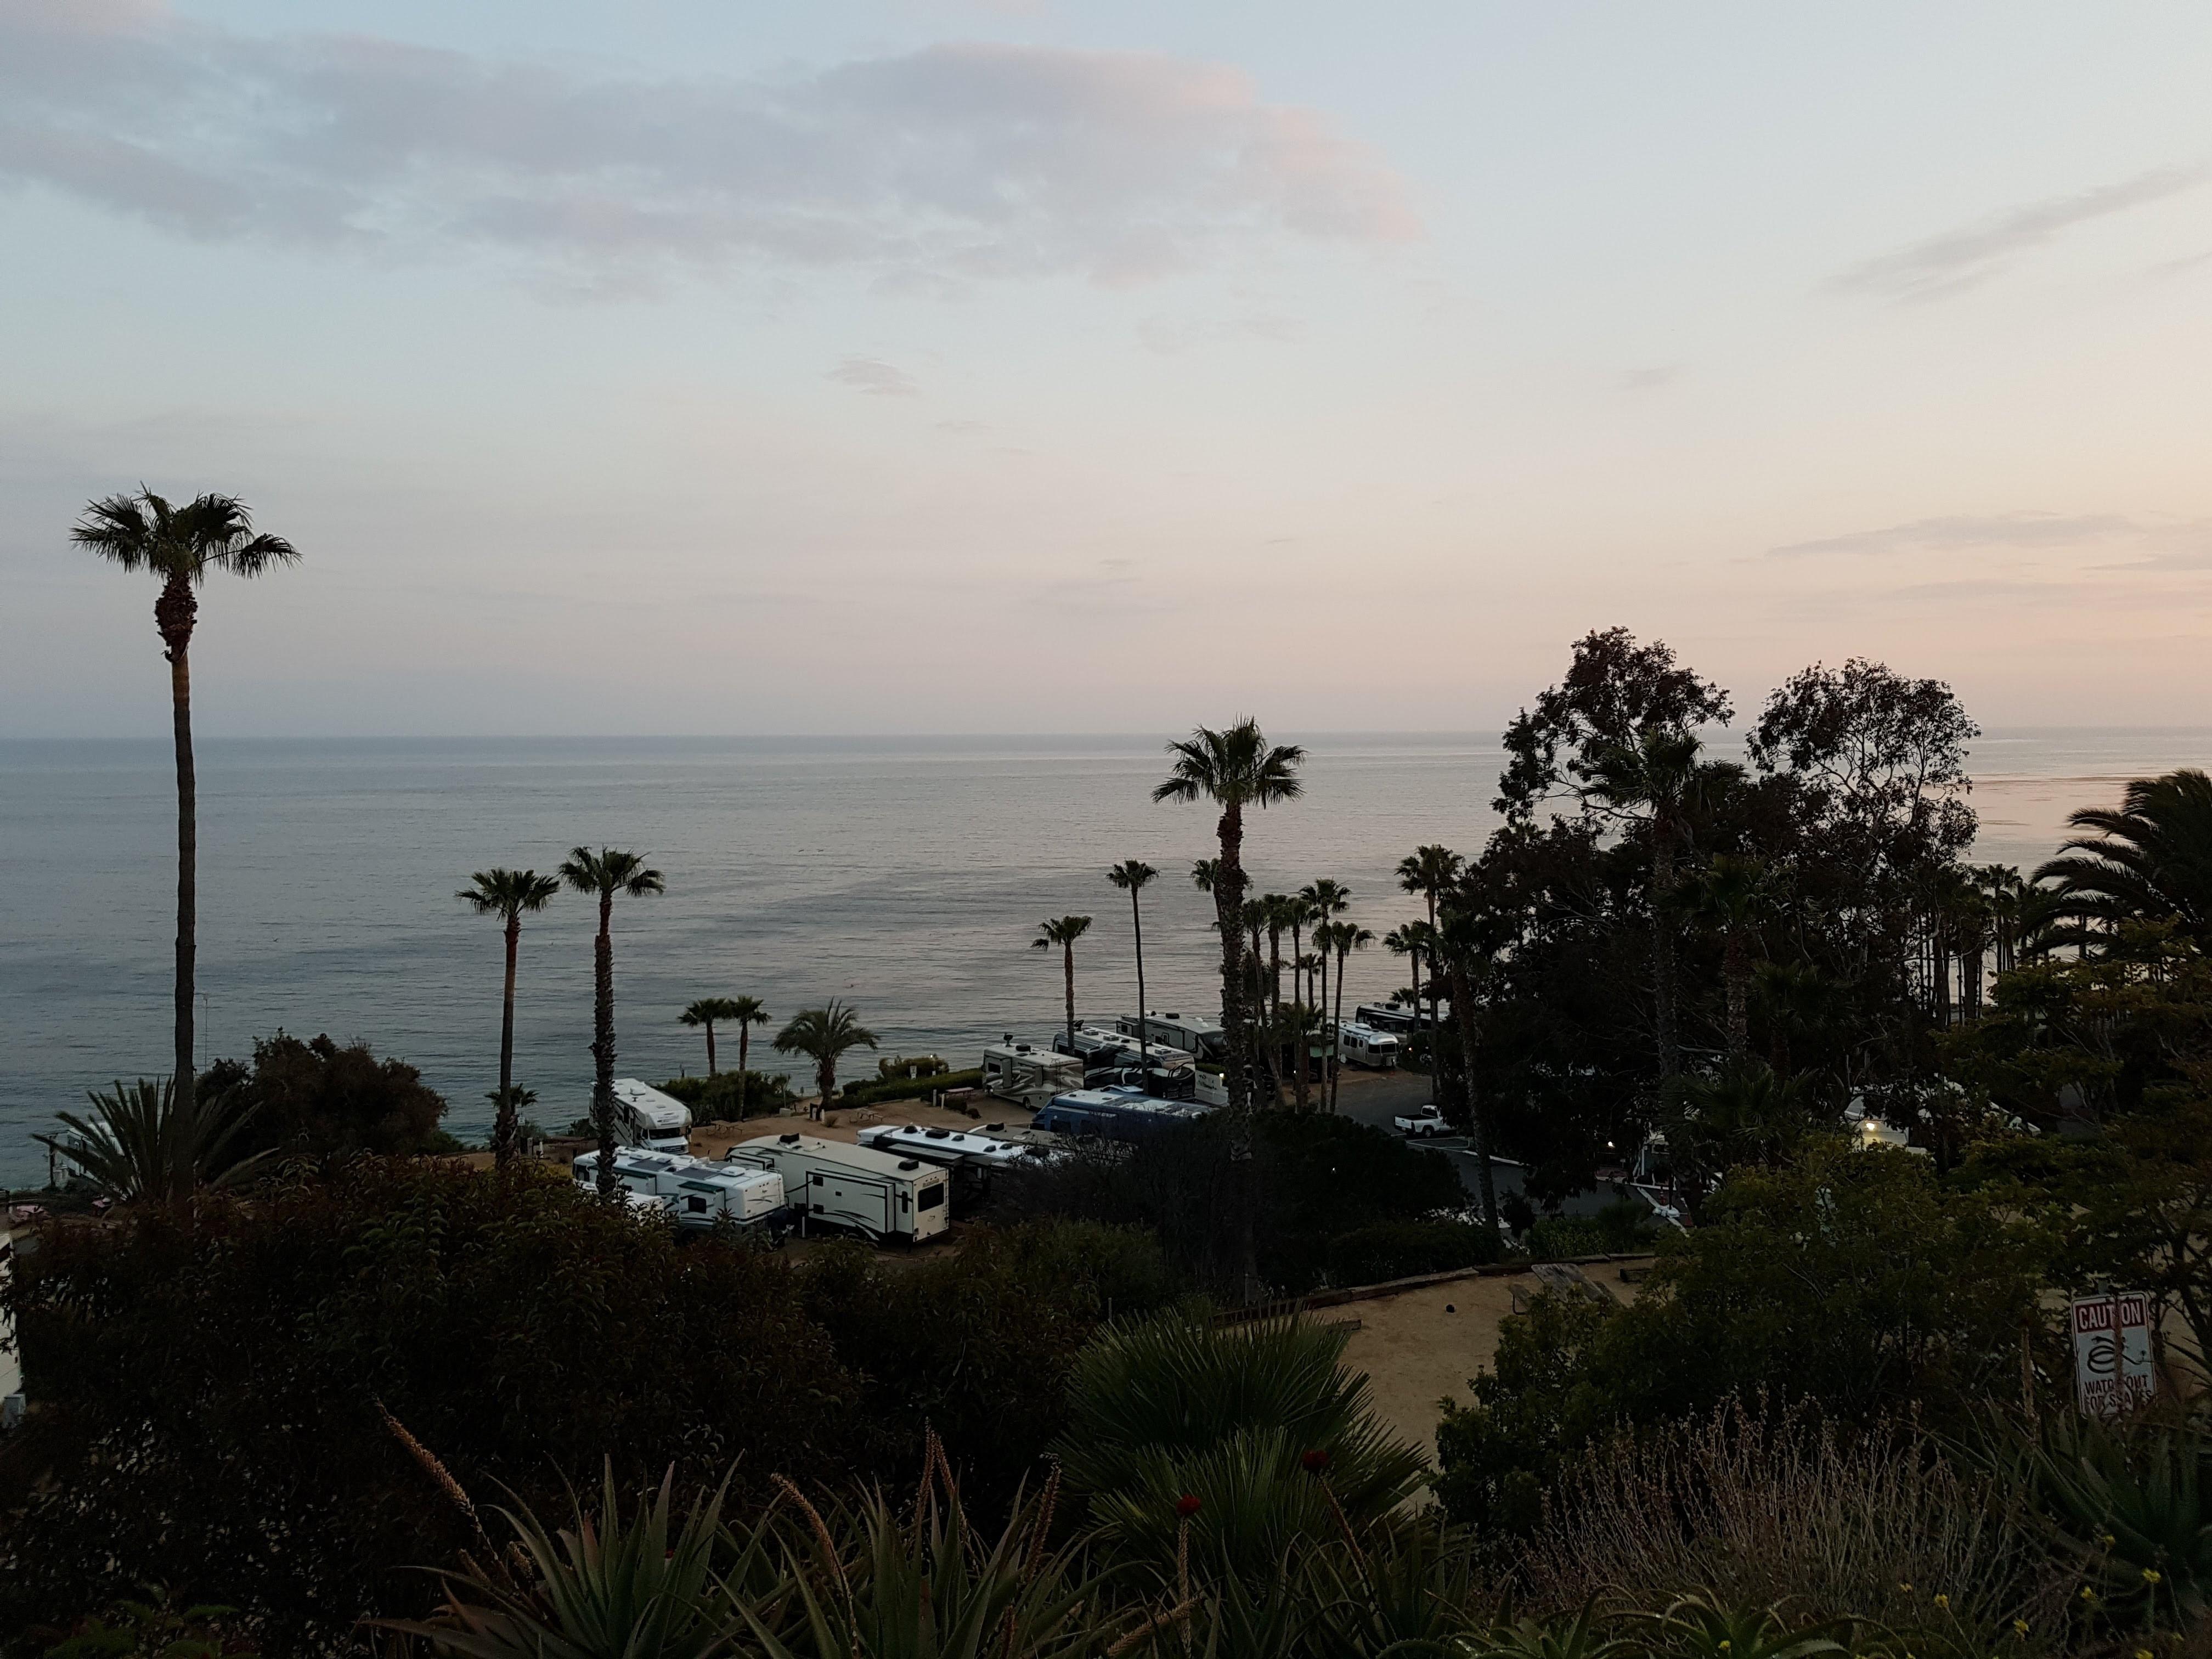 usa adventures states malibu california aussie travel blogger lifestyle